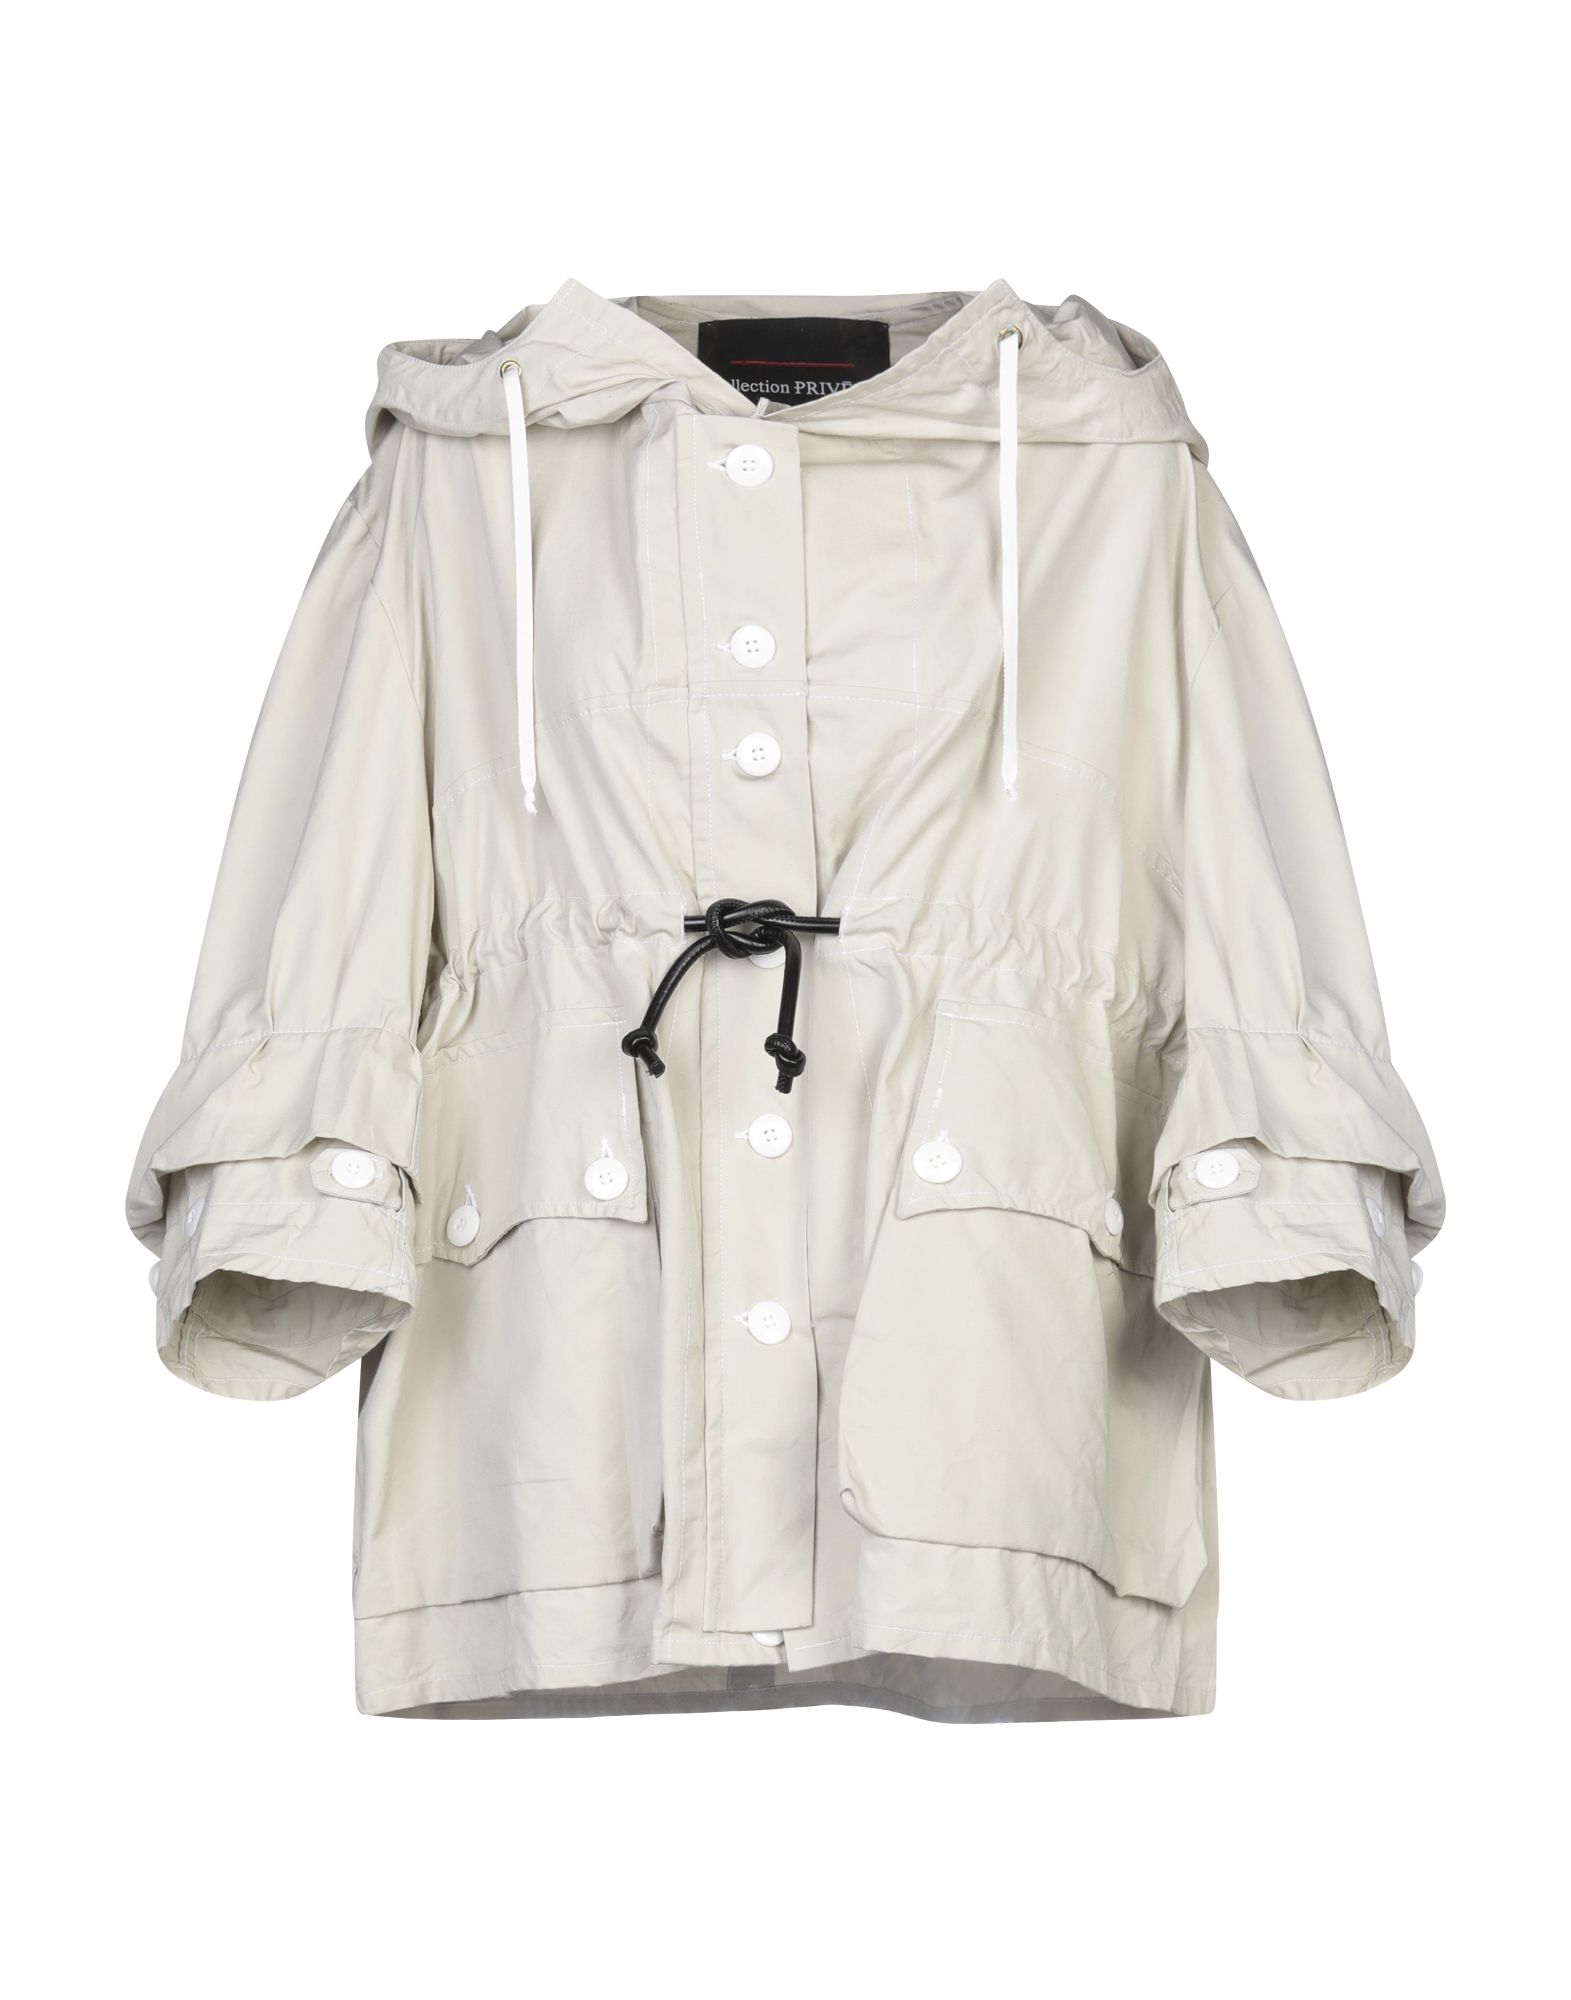 COLLECTION PRIVĒE? Куртка